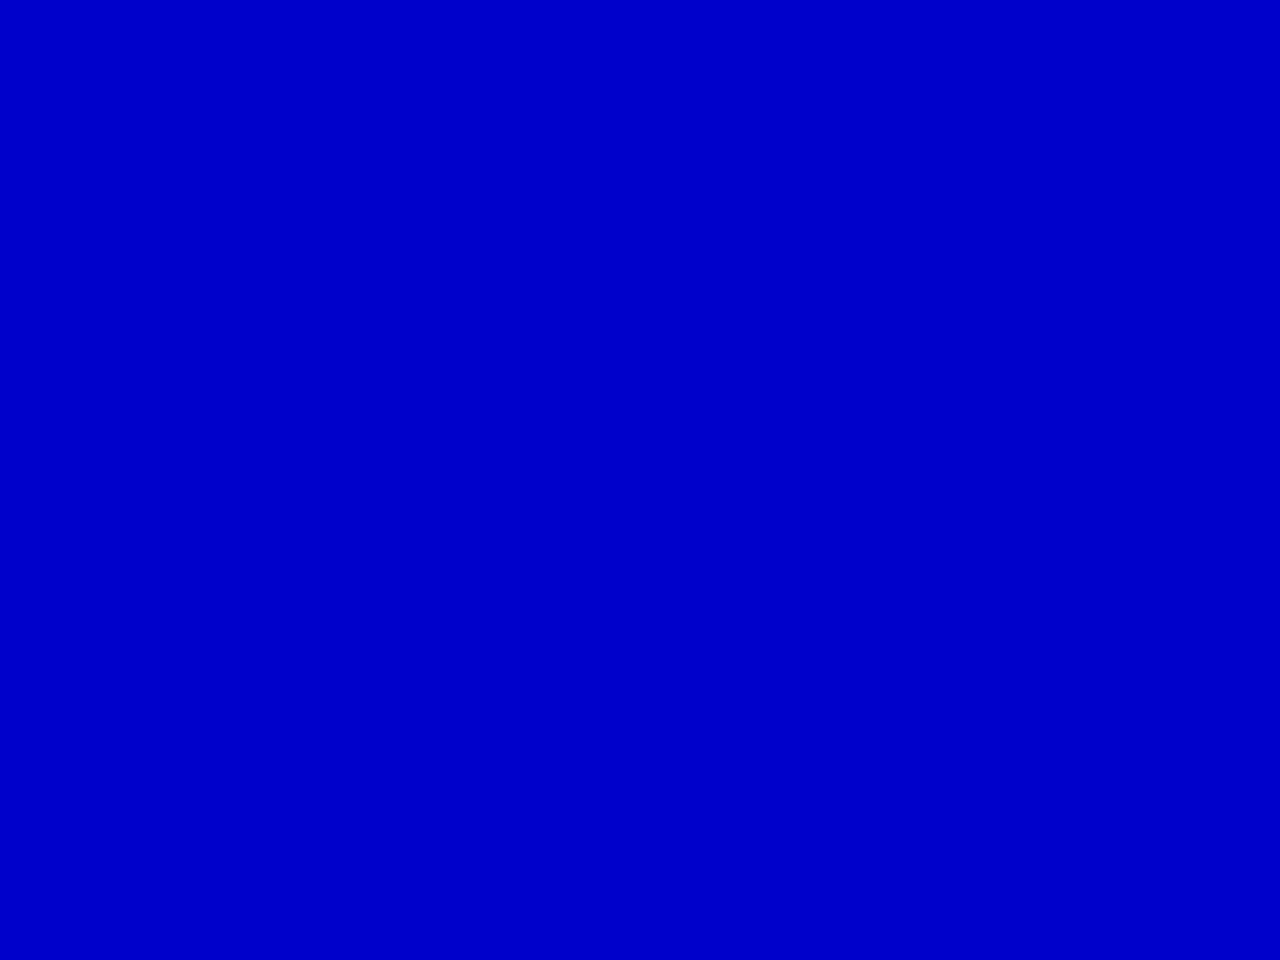 1280x960 Medium Blue Solid Color Background